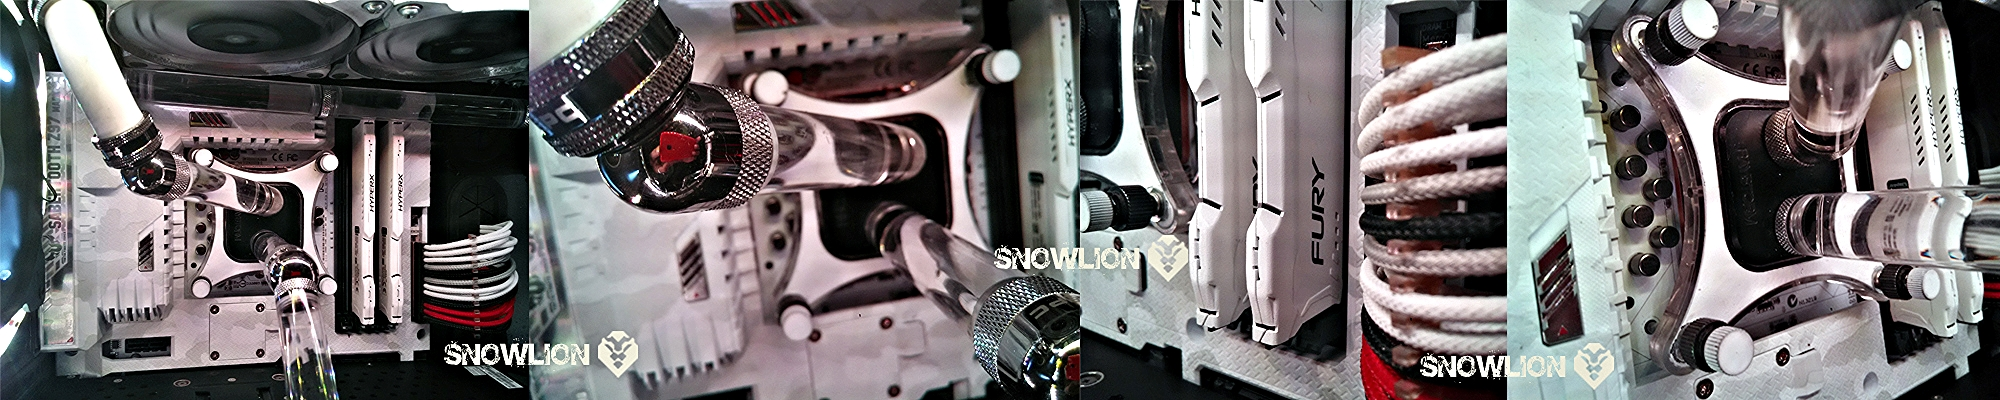 snowlion77